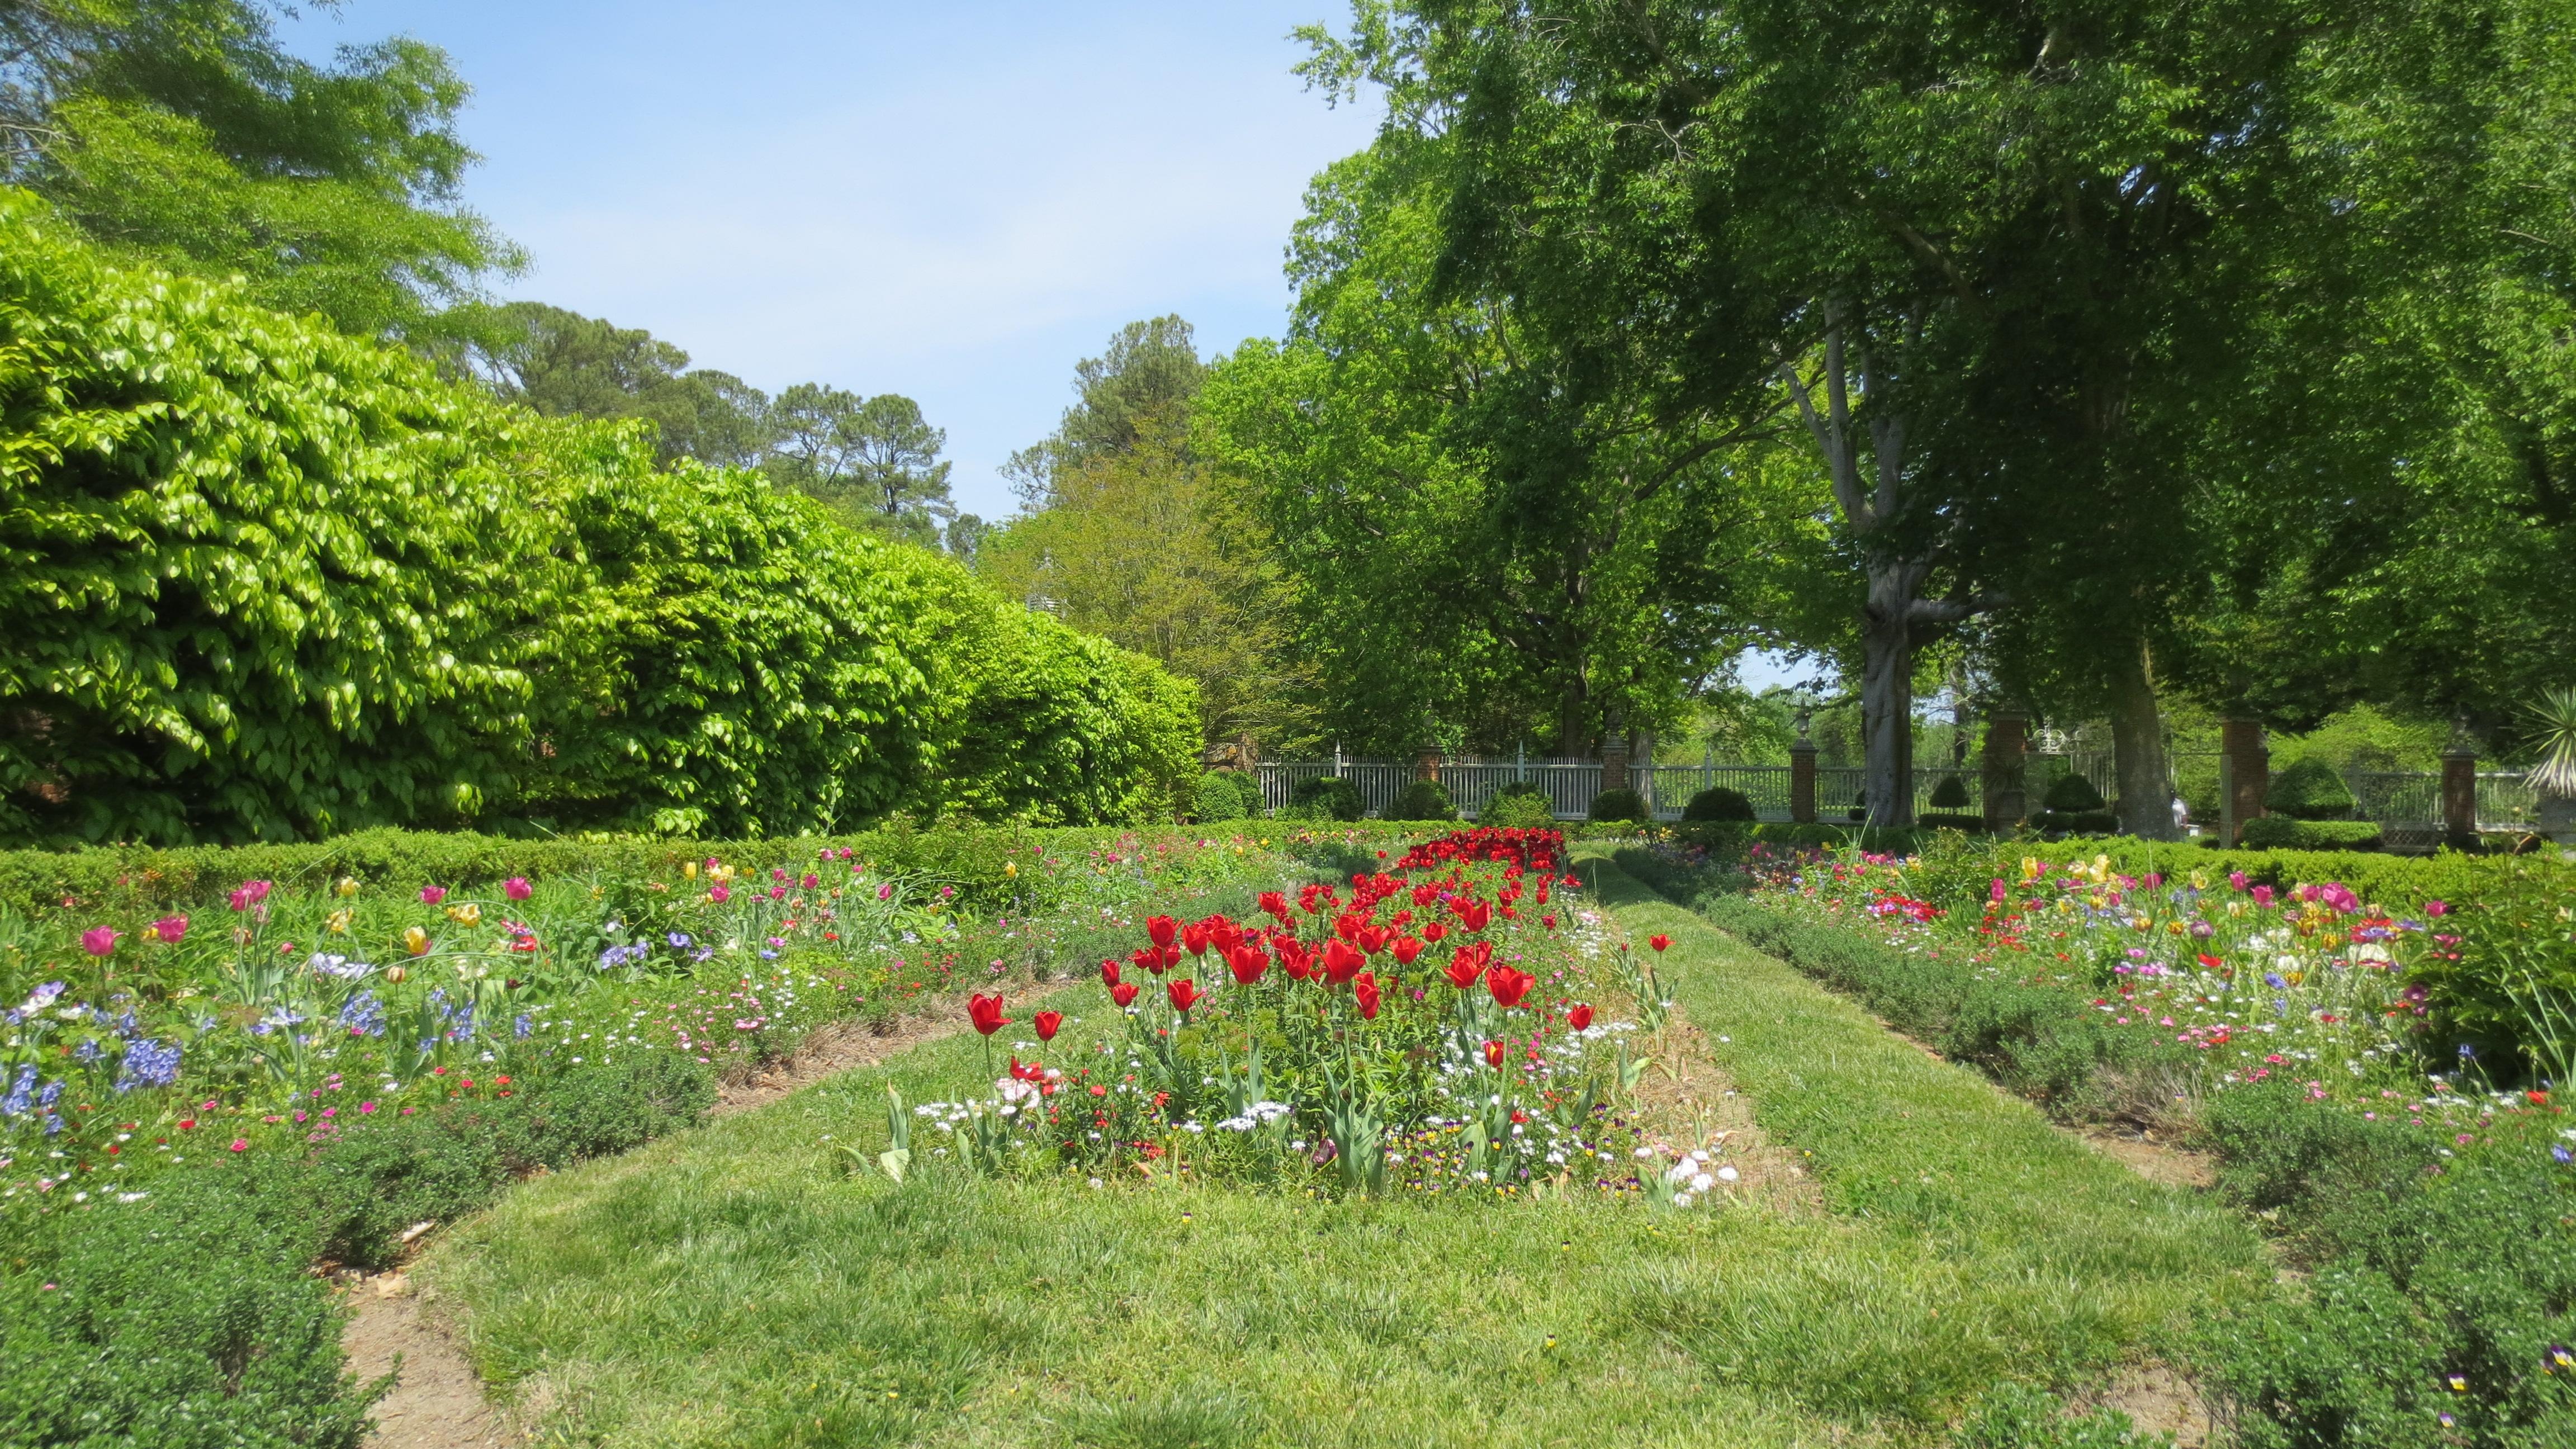 Palace Formal Gardens